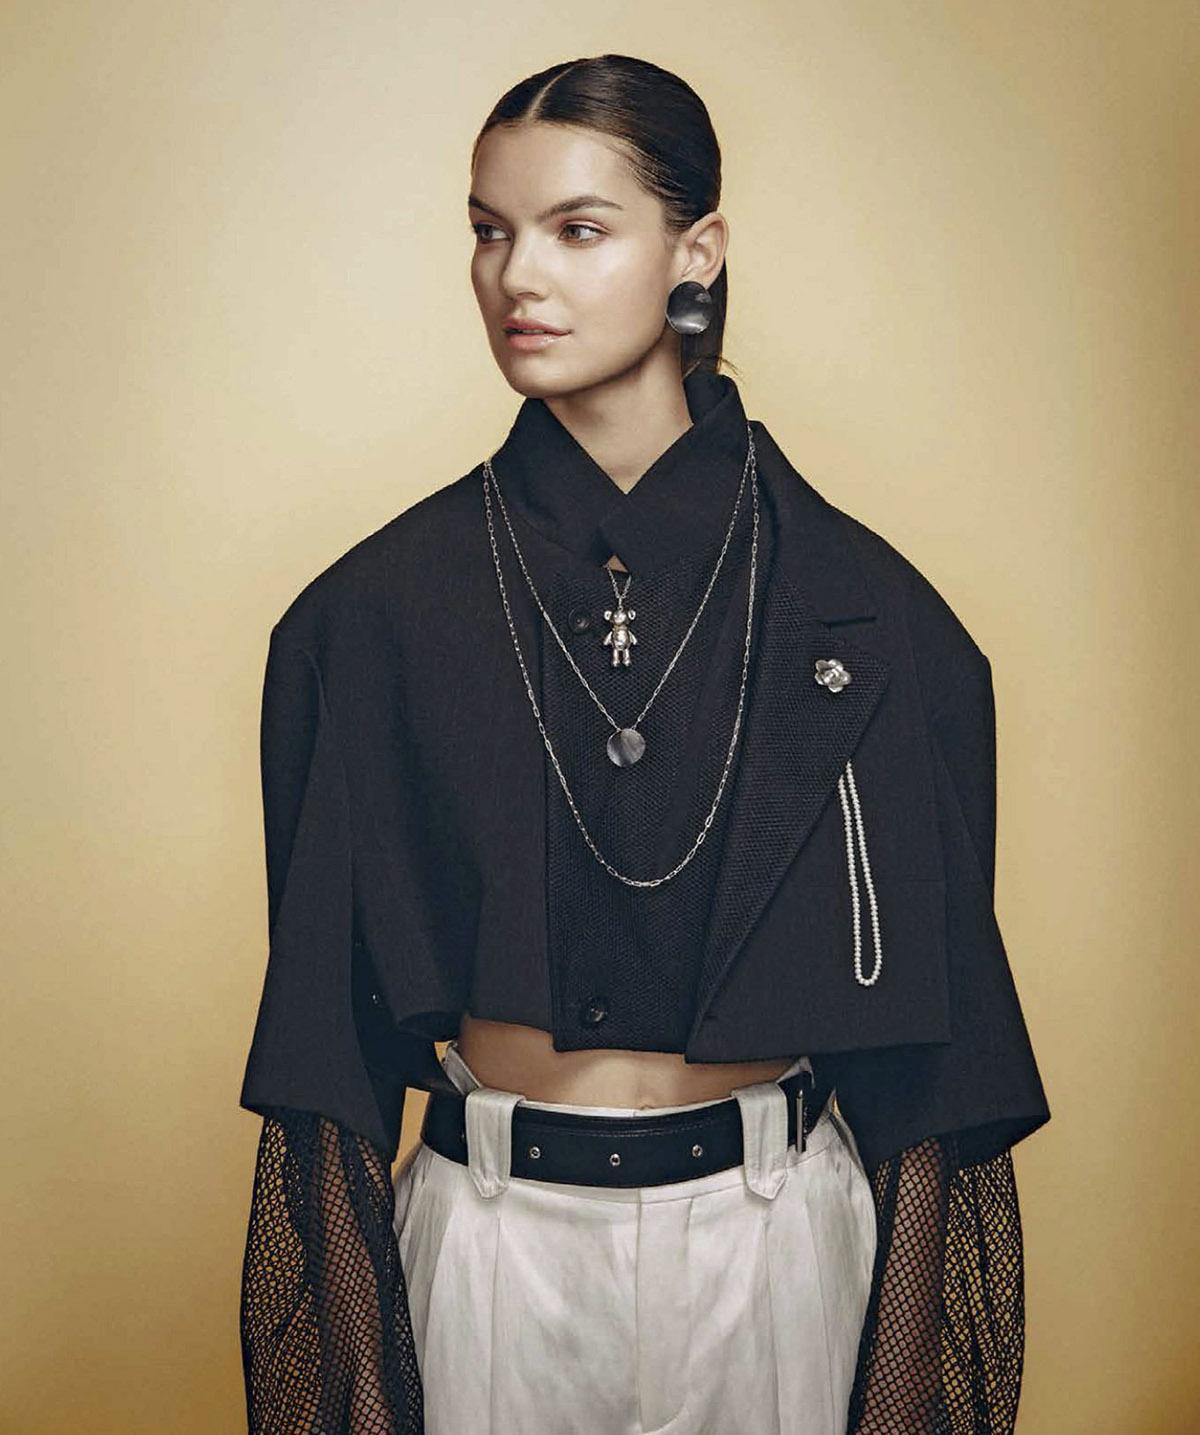 Irene Lorenzon and Clark Coombs by Miguel Garcia for Harper's Bazaar Mexico & Latin America June 2021